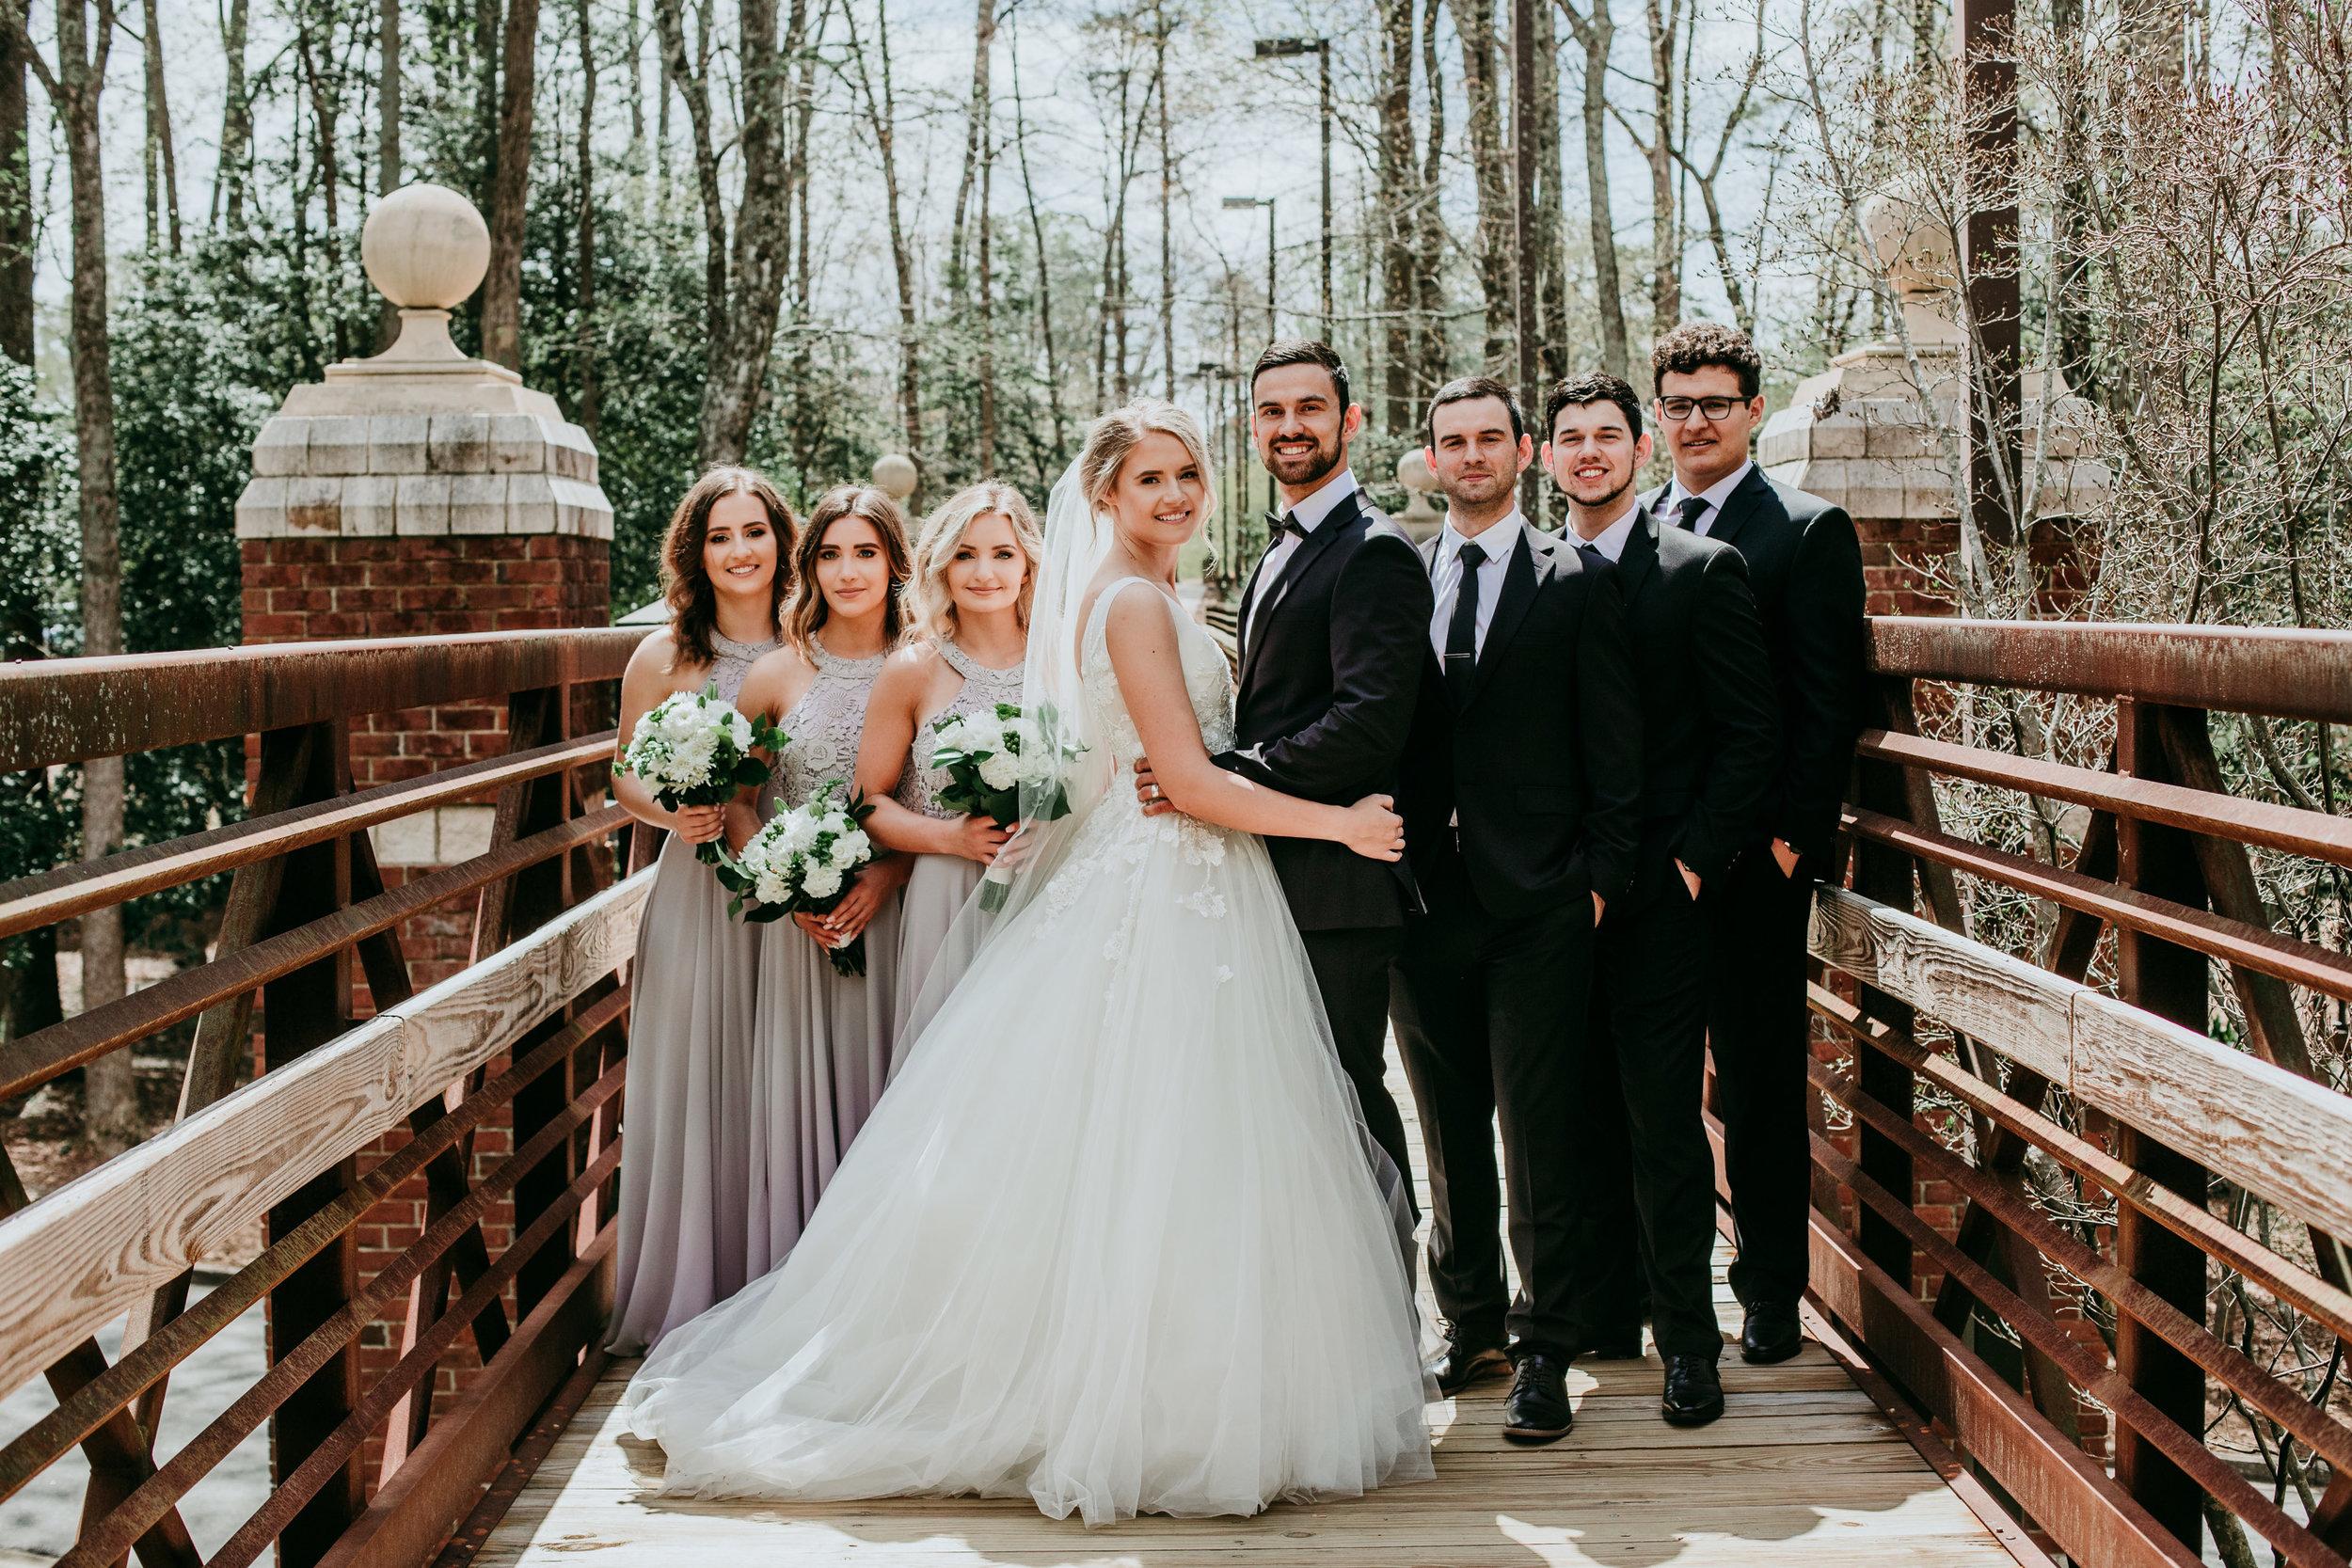 bride-and-groom-photo-poses.jpg